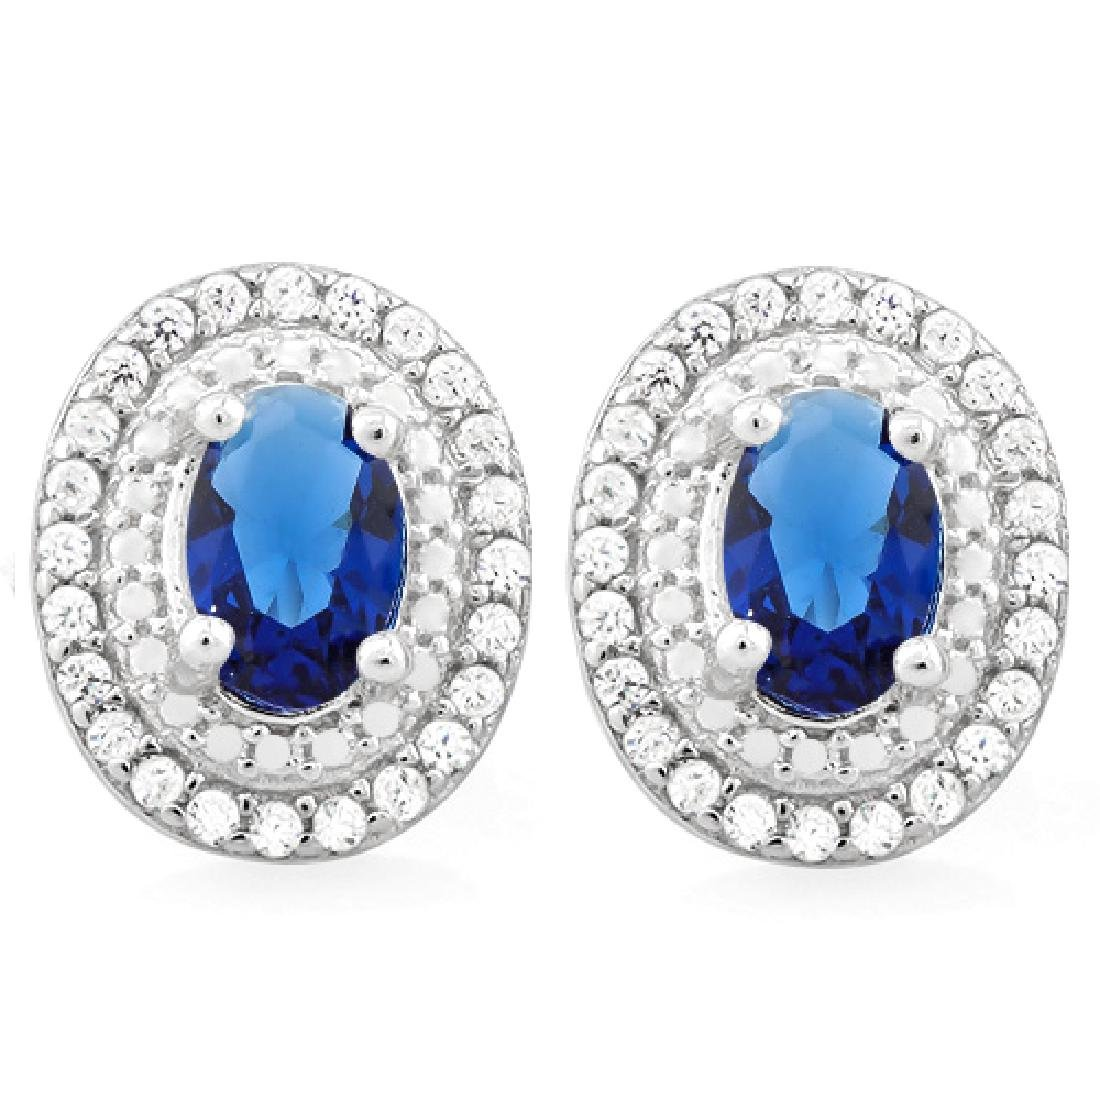 2 CARAT CREATED BLUE SAPPHIRE & 3/5 CARAT (60 PCS) FLAW